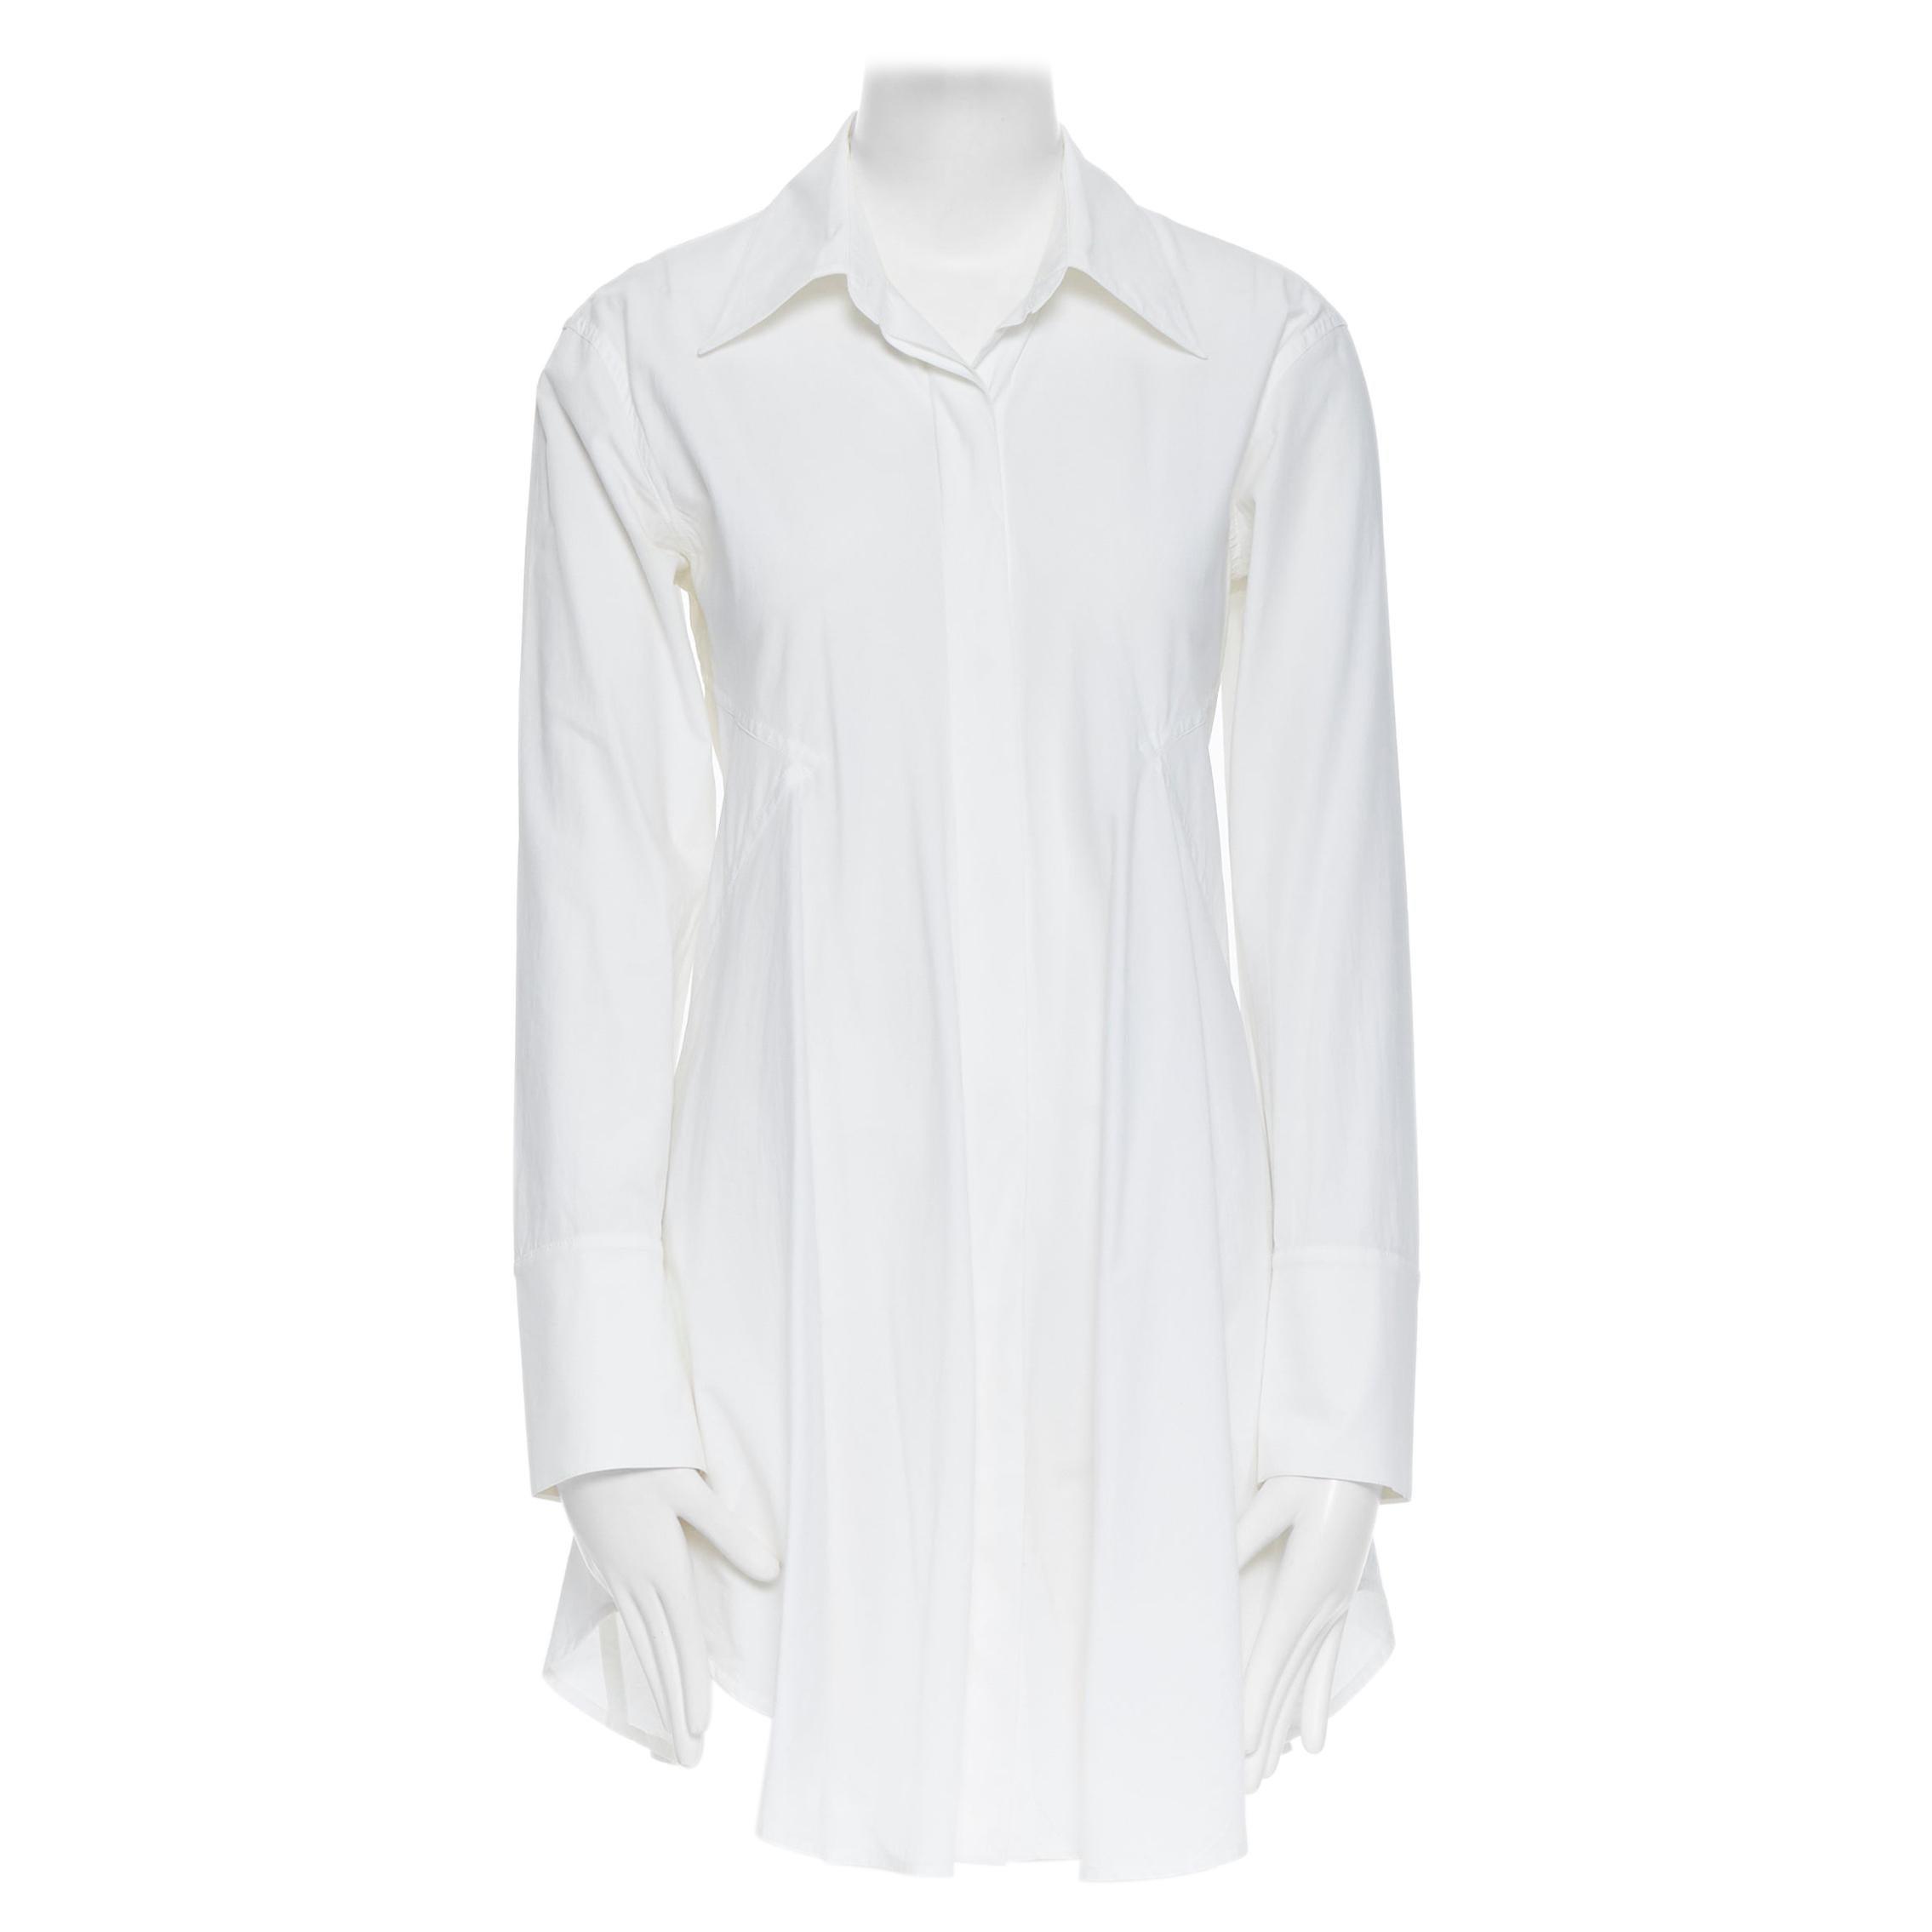 DONNA KARAN white cotton blend angular dart slit pocket mini shirt dress US2